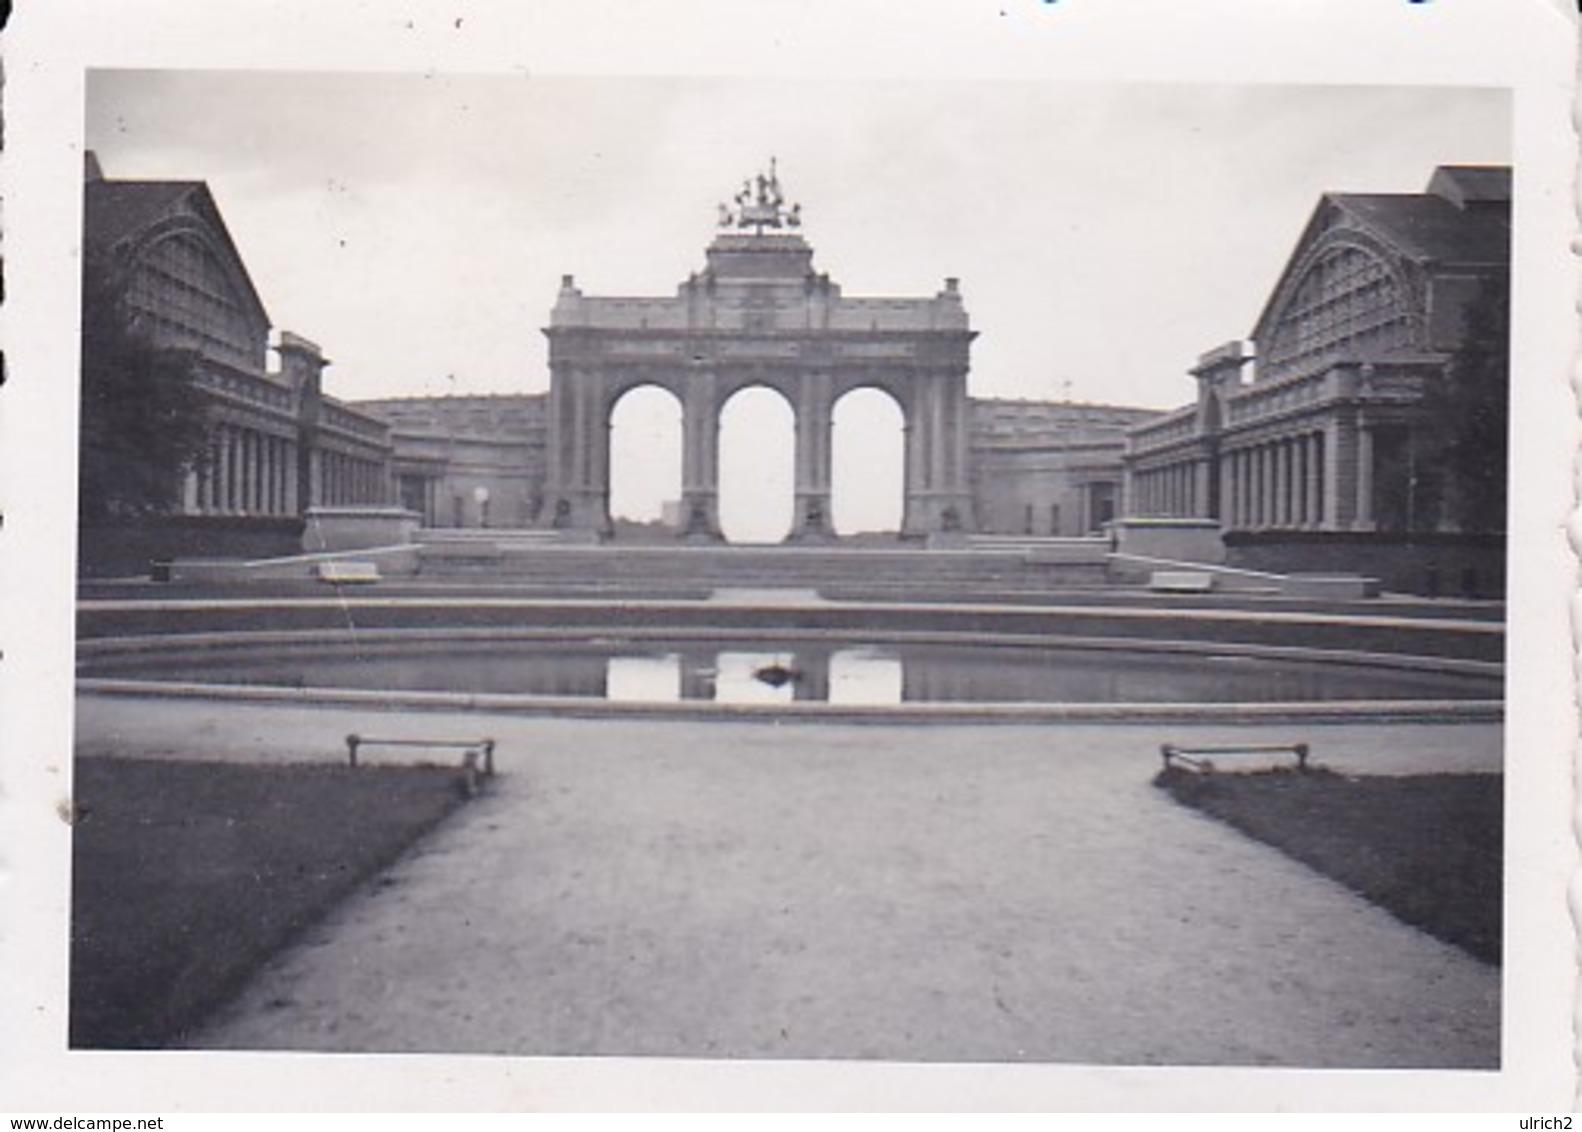 Foto Brüssel - Triumphbogen  - Ca. 1940 - 7,5*5cm  (41776) - Orte